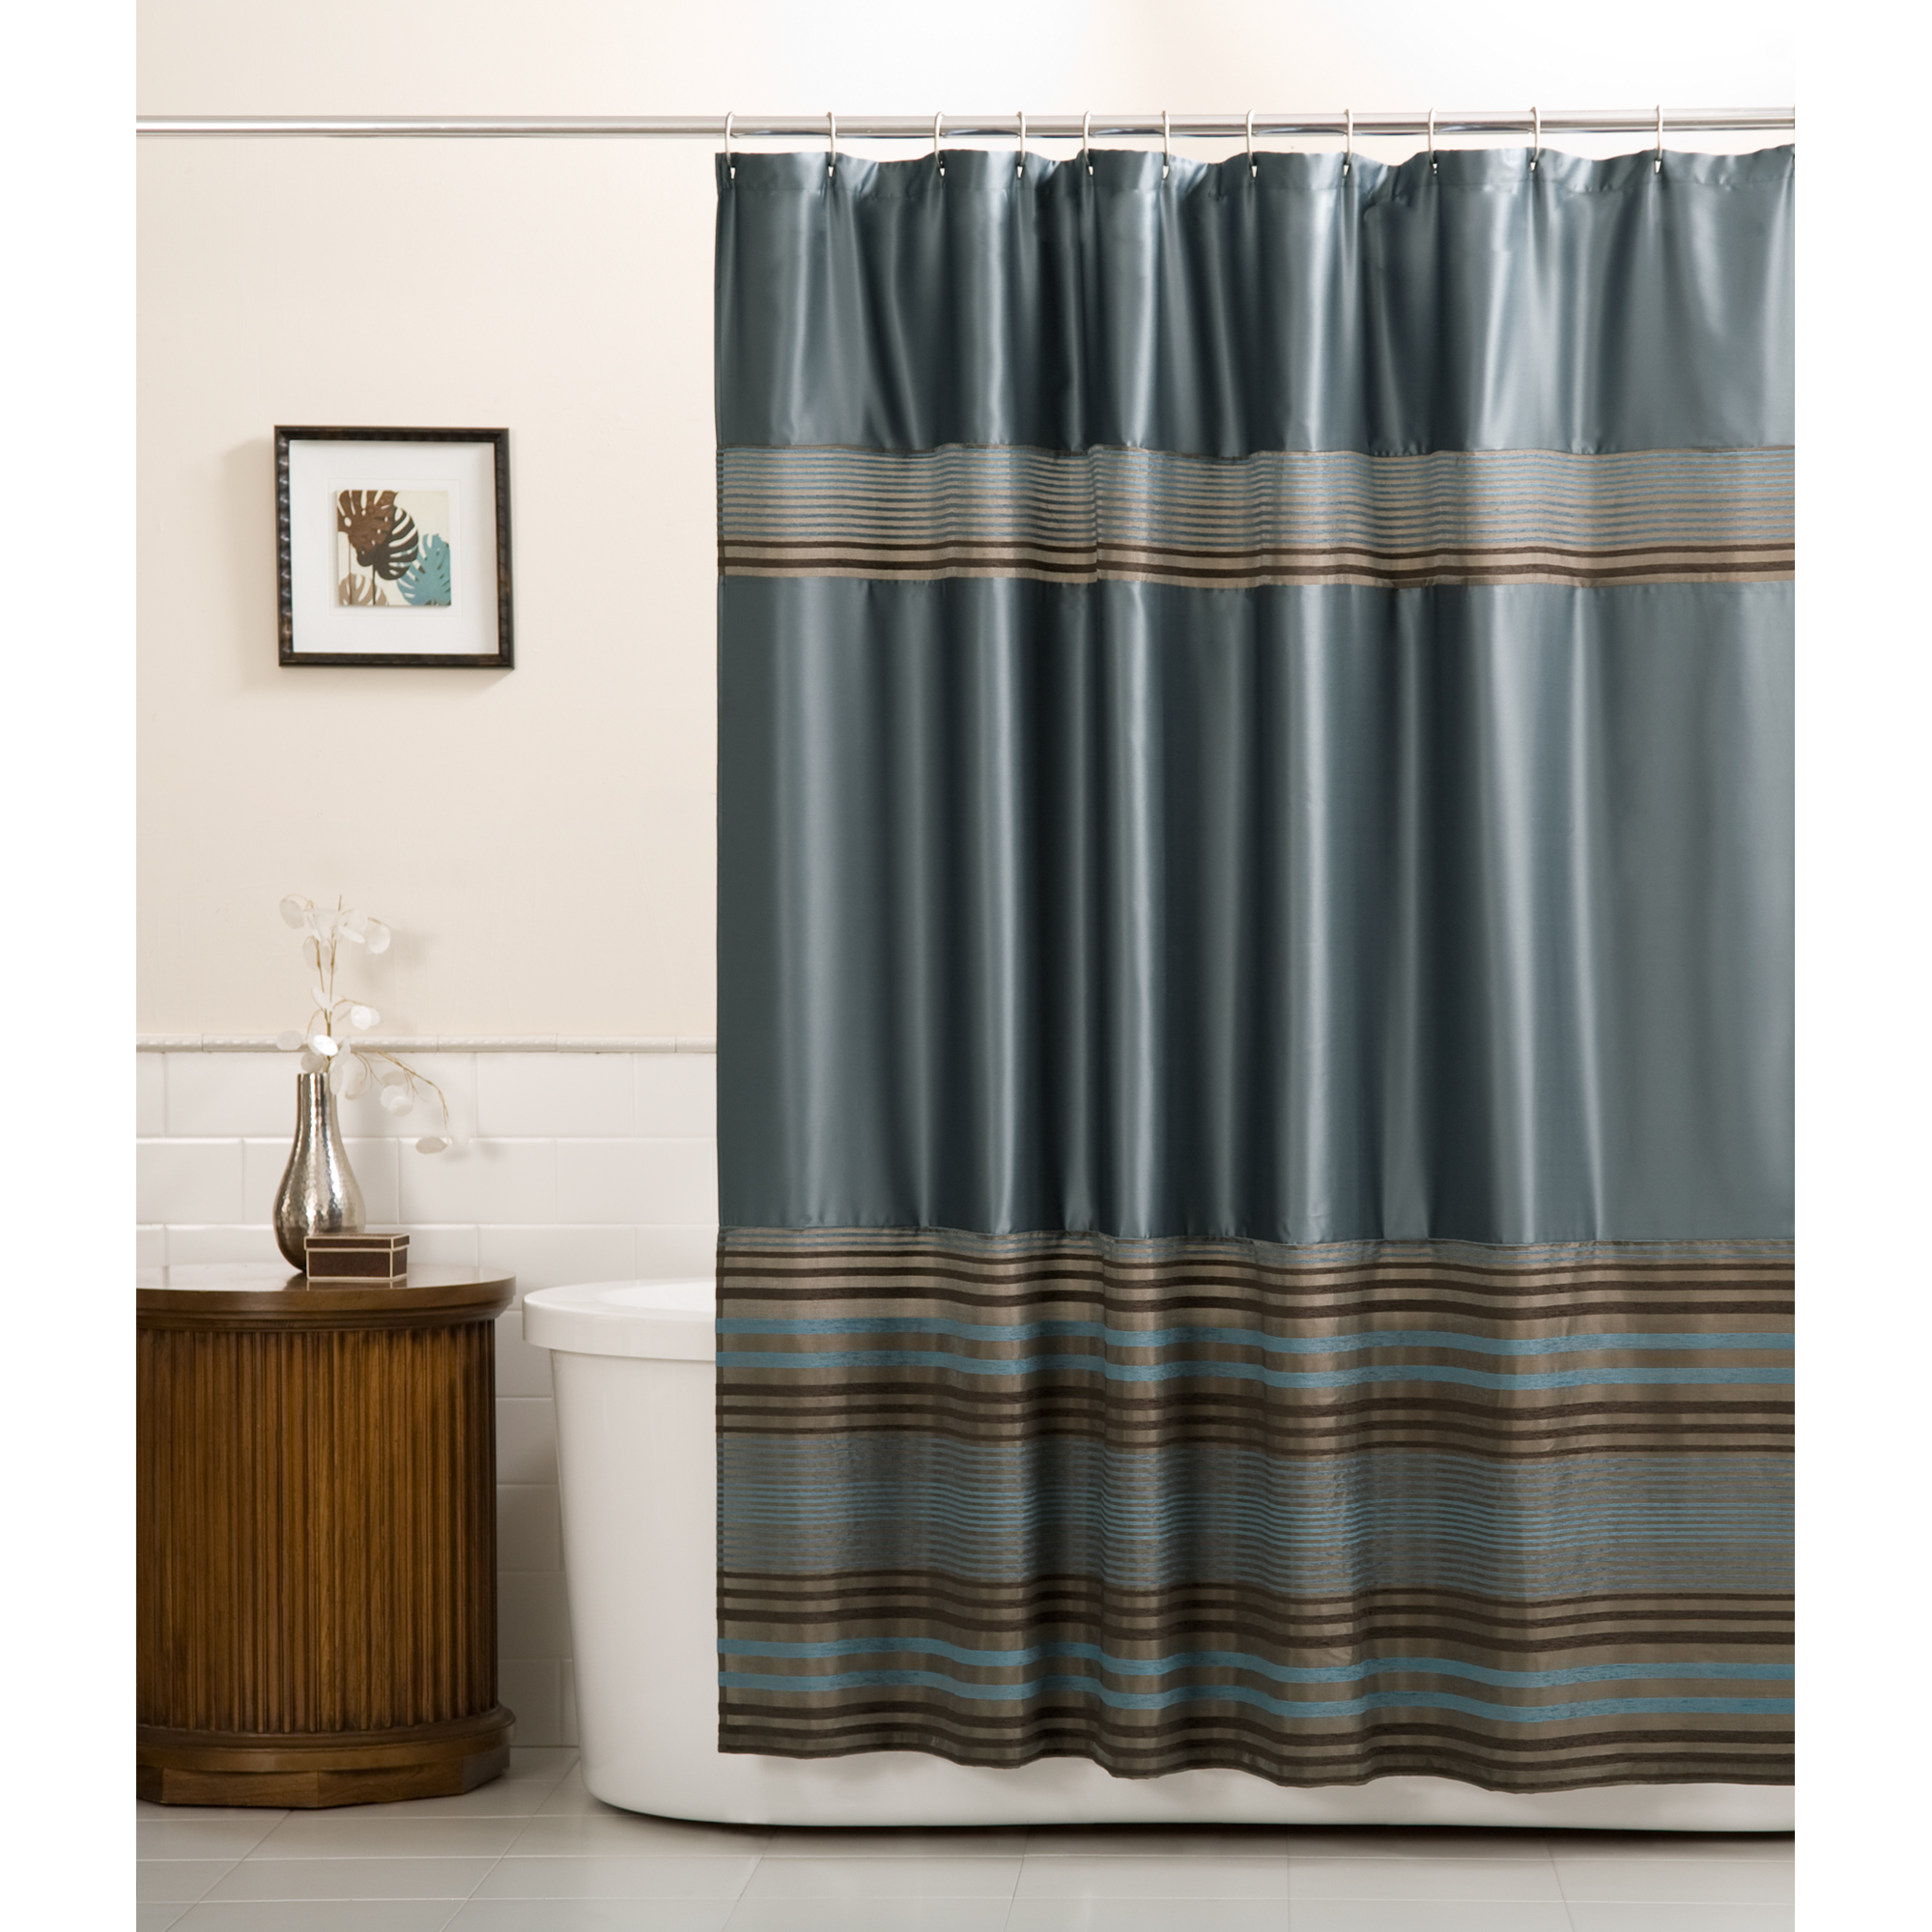 Mark Fabric Shower Curtain, Blue